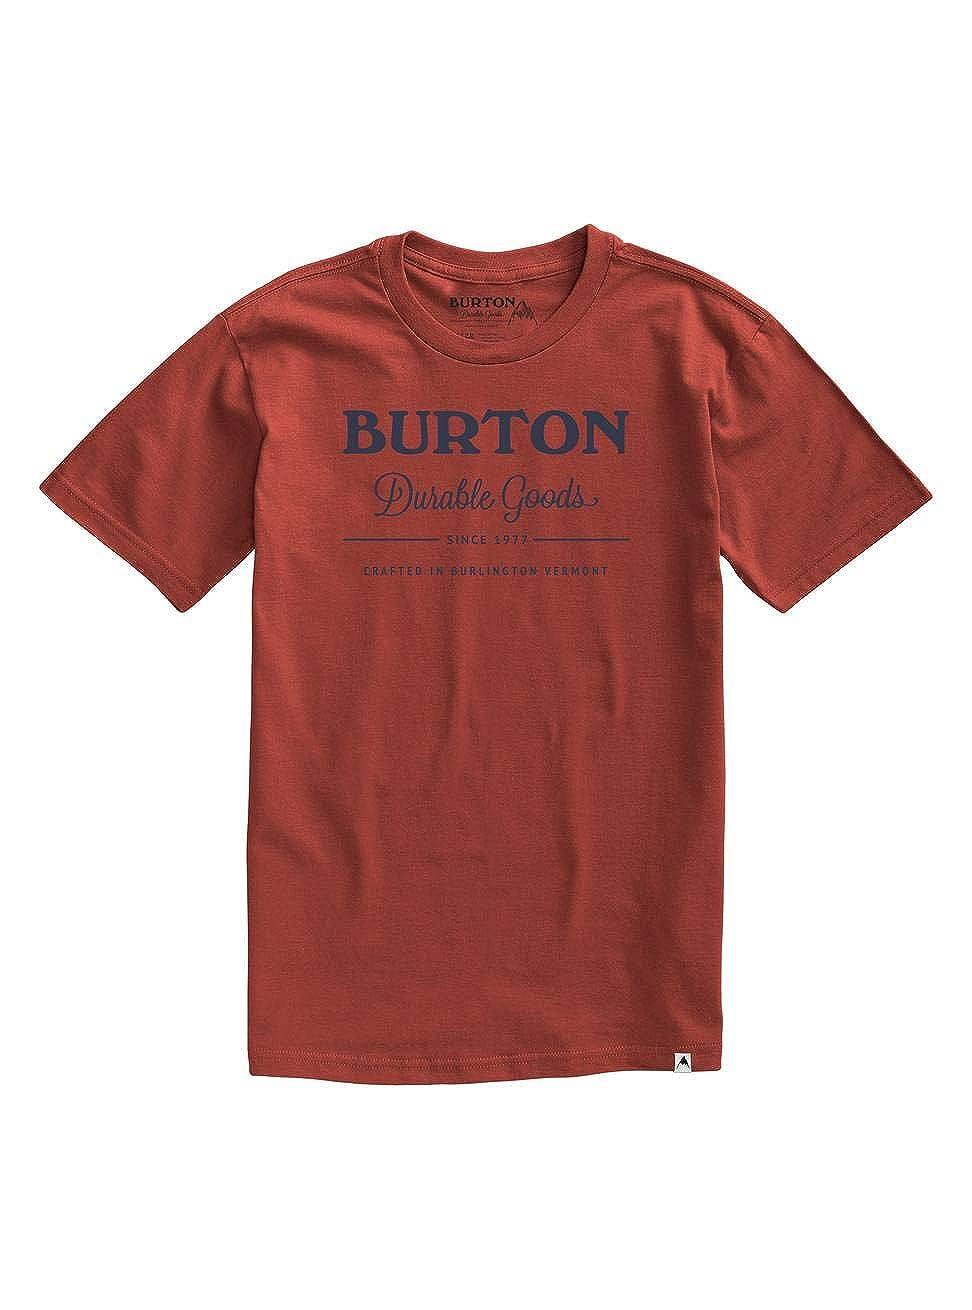 Burton Durable Goods Shortsleeve Camiseta, Hombre